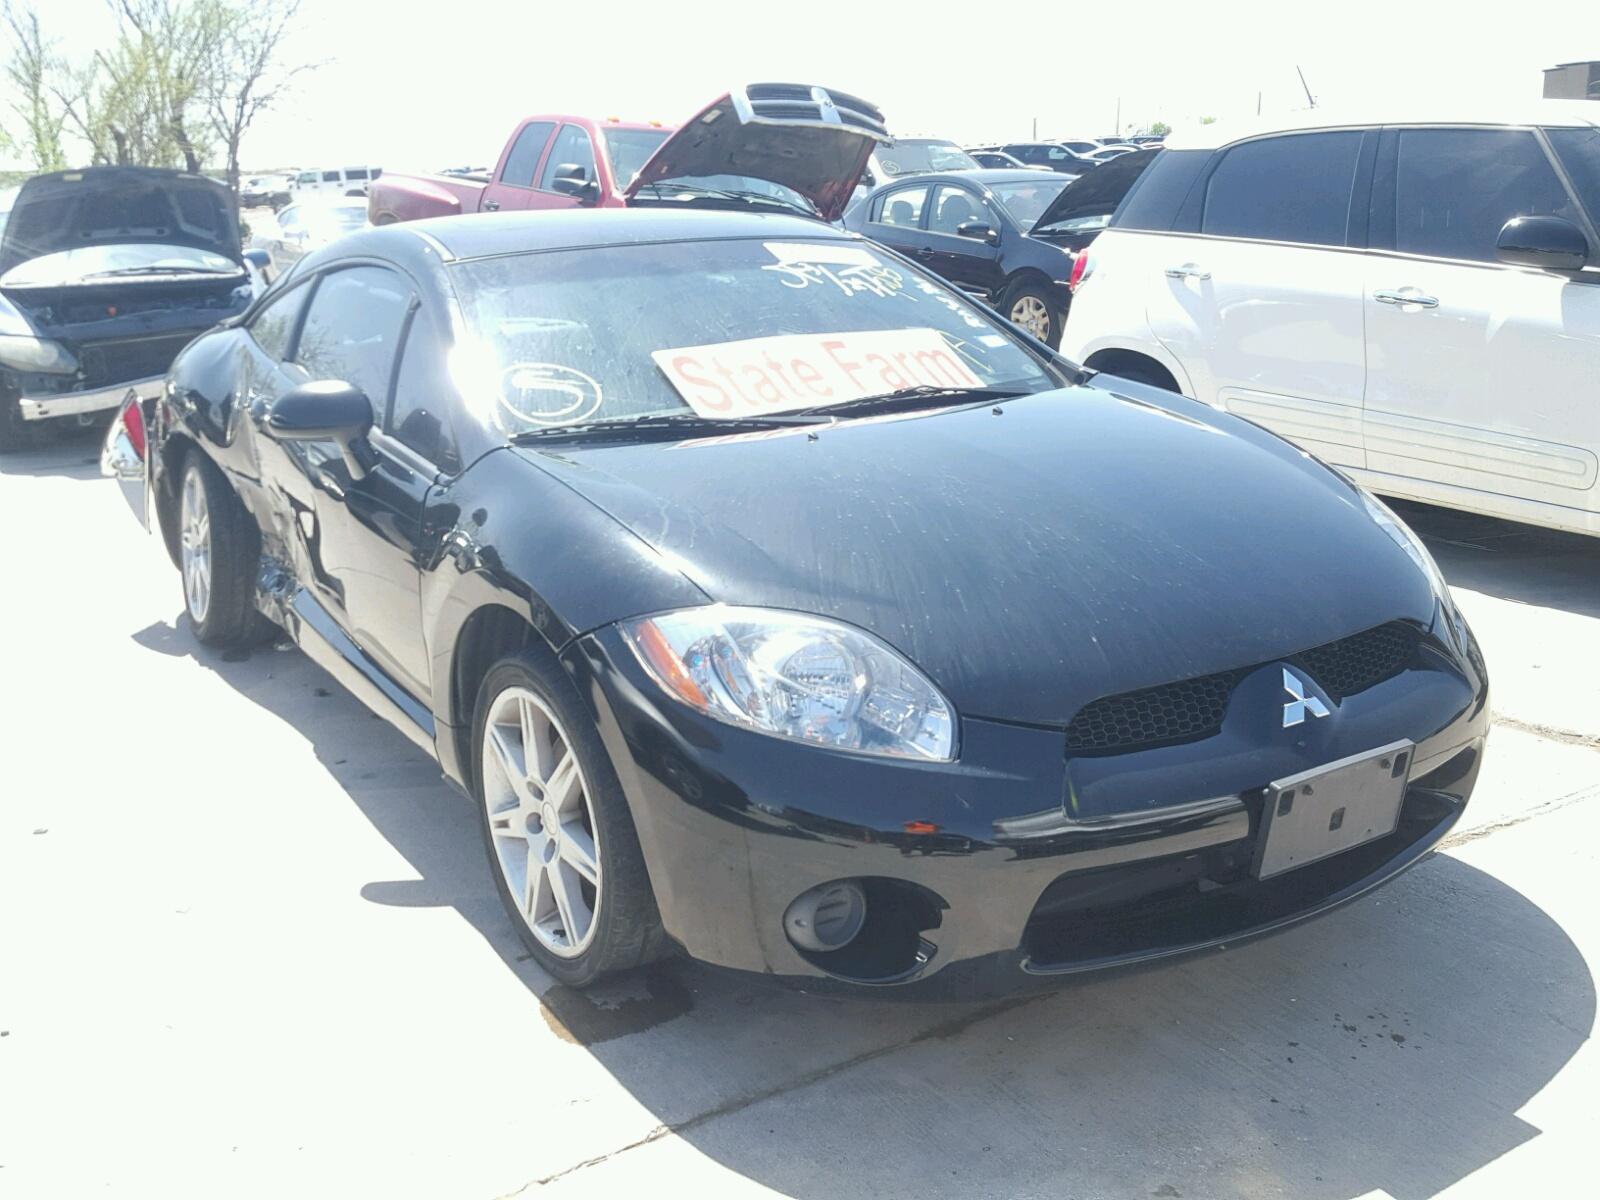 and trucks gt revo cars houston eclipse vista sale for in city mitsubishi texas